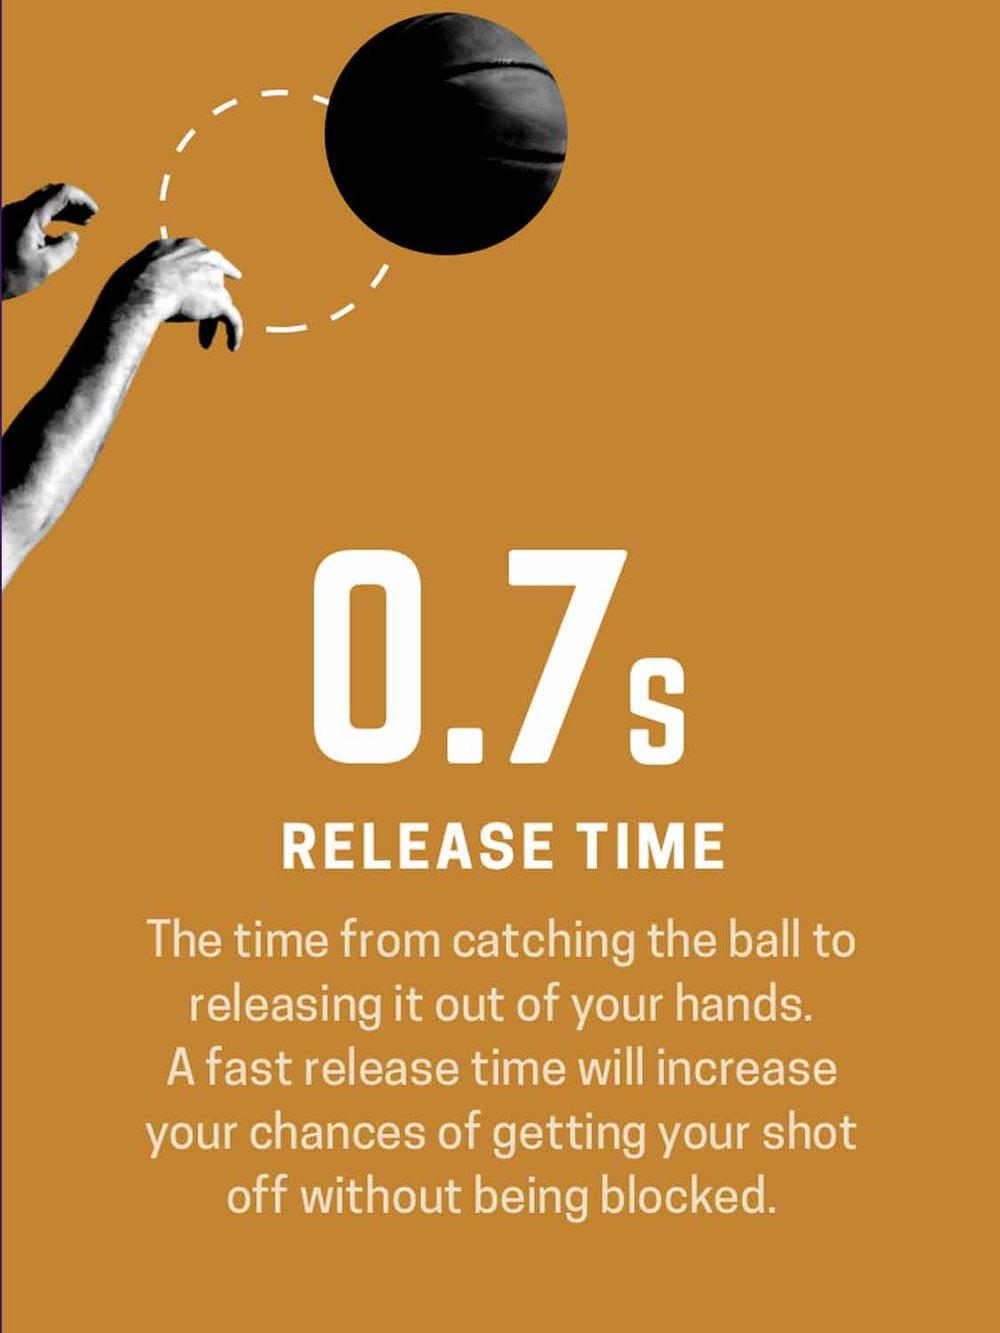 release-time.jpg